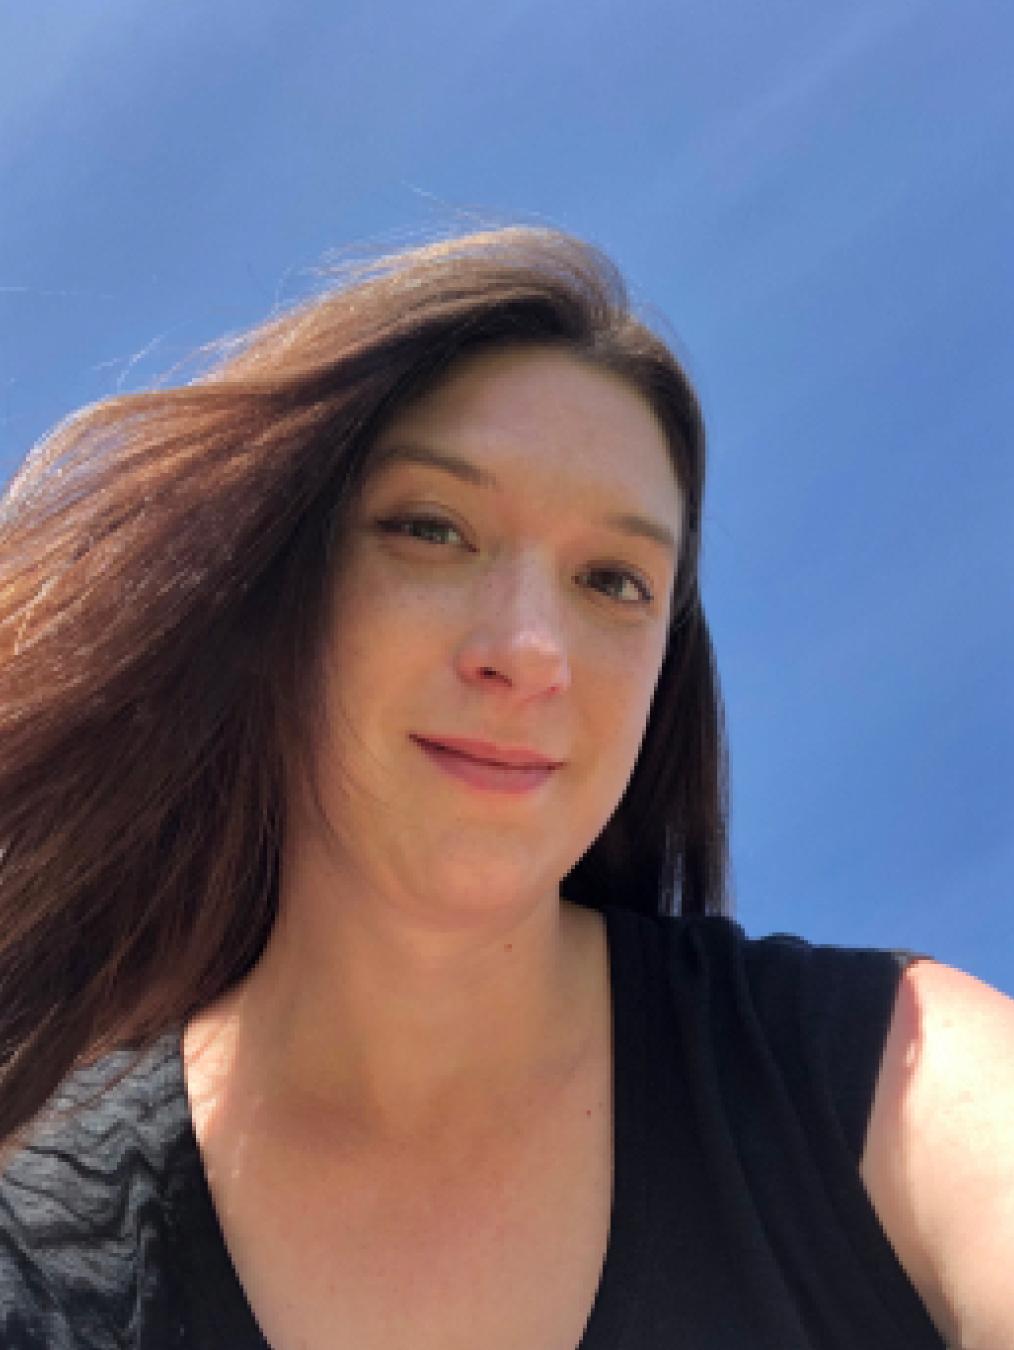 Megan Treverthen - Senior Project Manager, New Partnerships